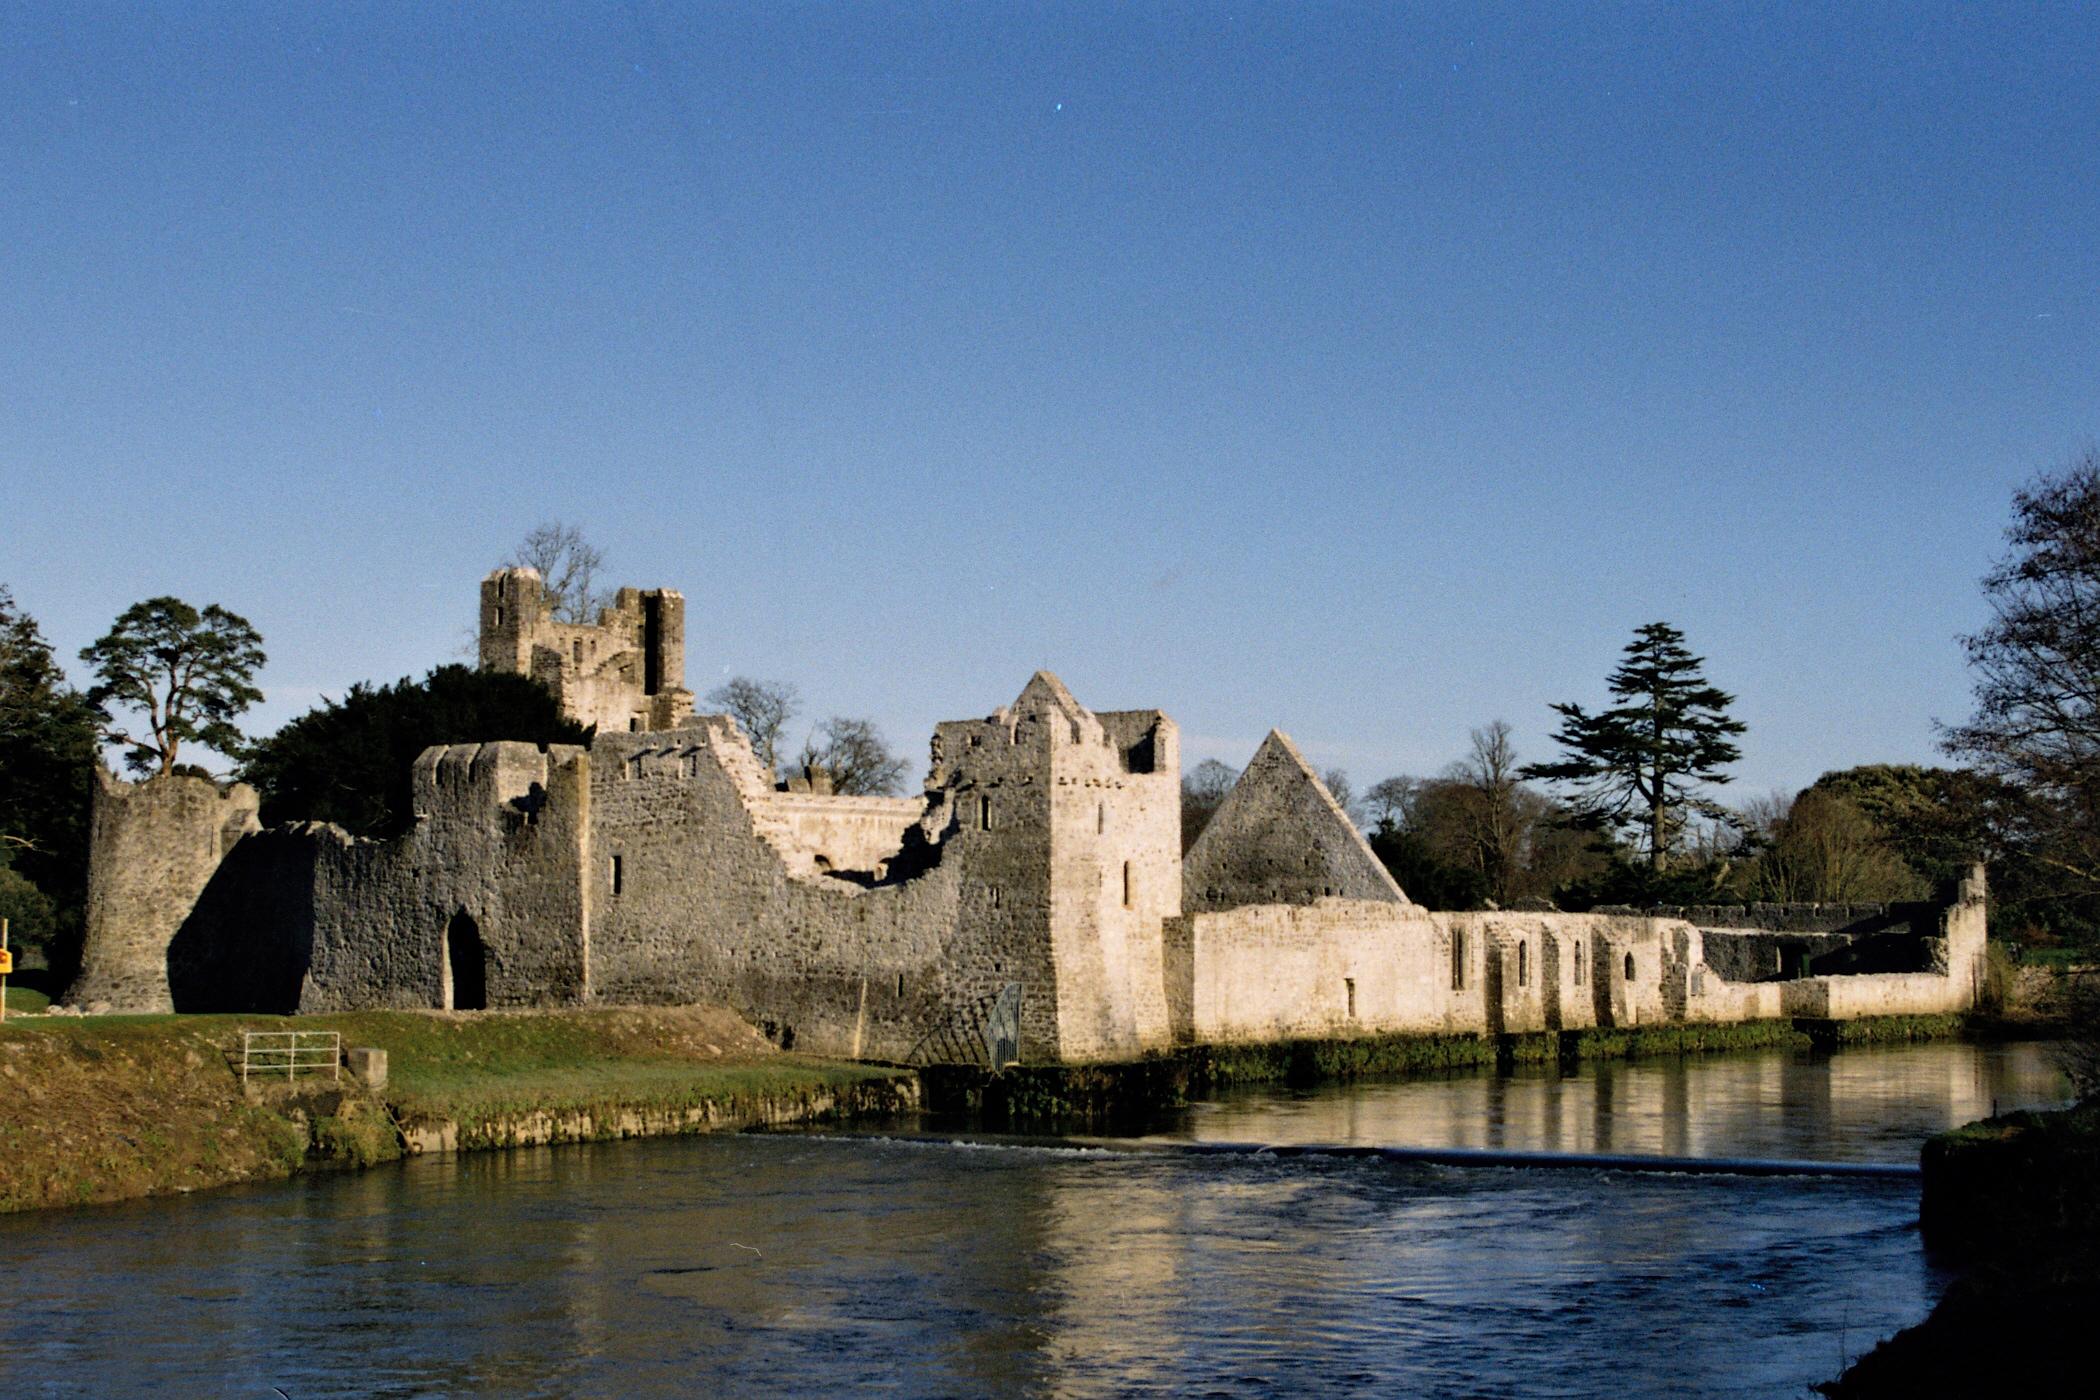 Adare Heritage Centre Adare Desmond Castle Tours Adare